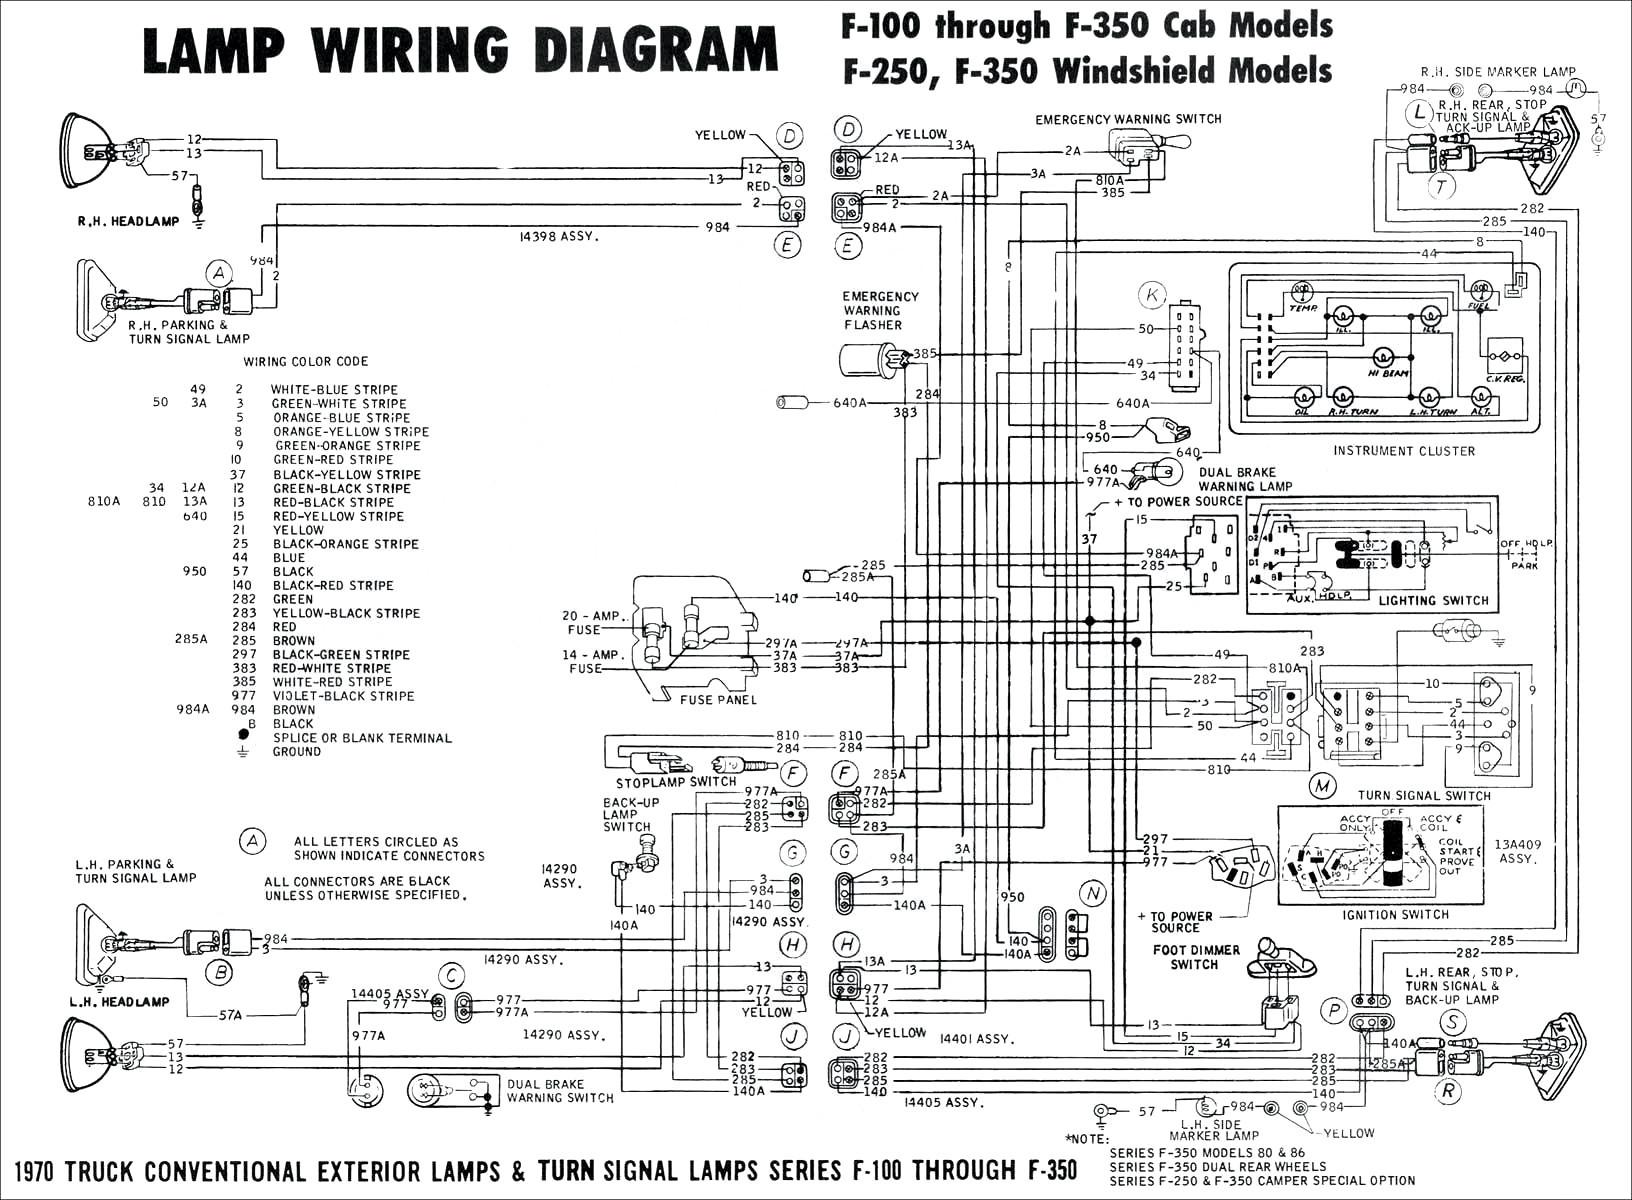 hight resolution of asco series 300 wiring diagram asco series 300 wiring diagram fresh tork time clock wiring